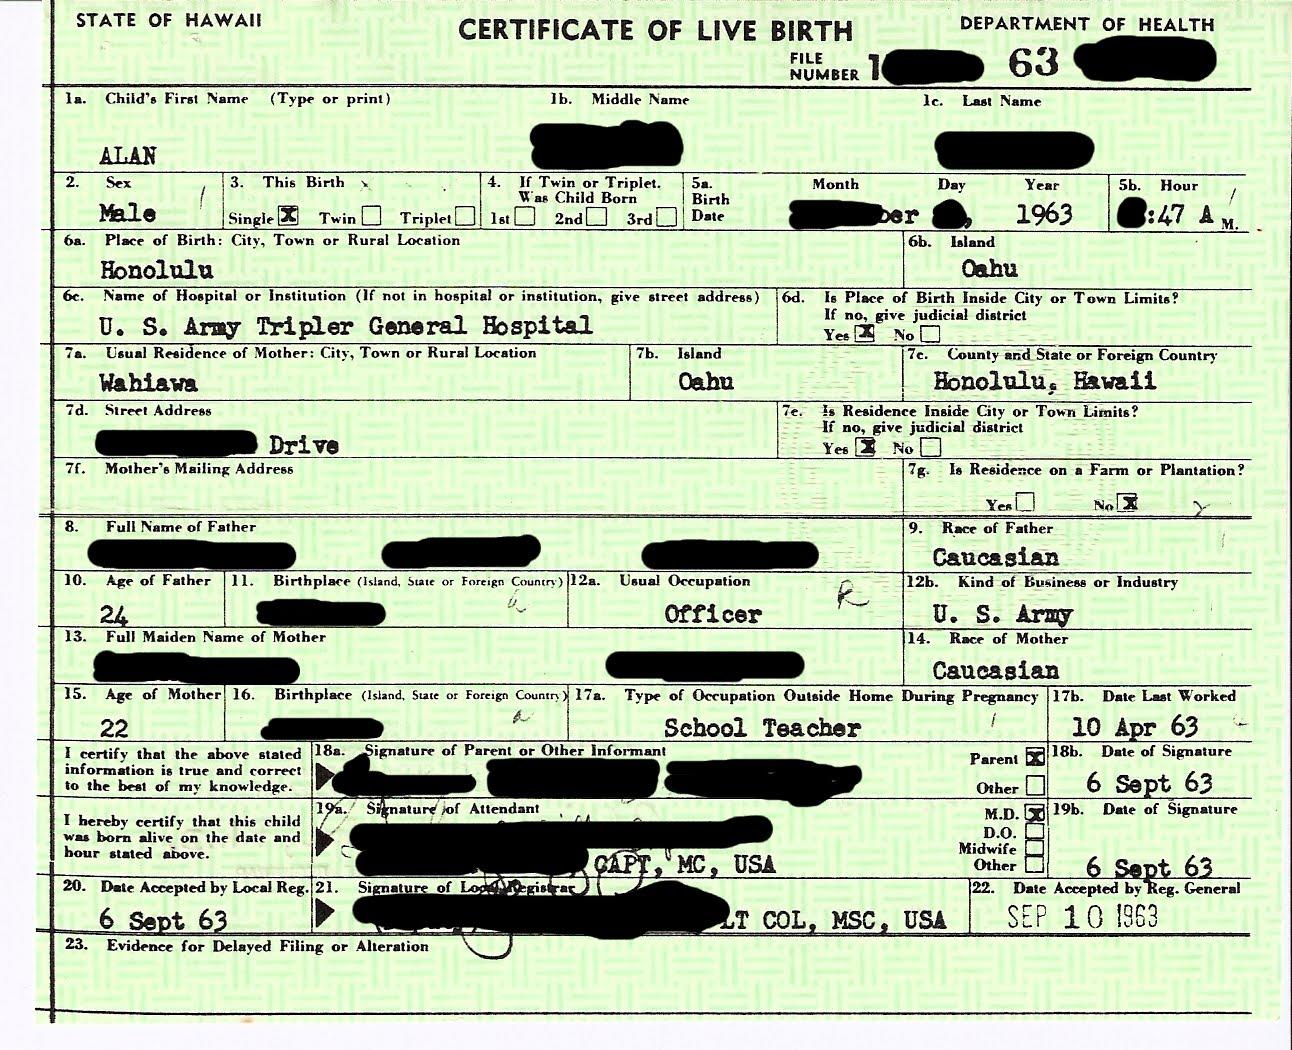 Obama Short Form Birth Certificate - Obama's Hidden Birth ...